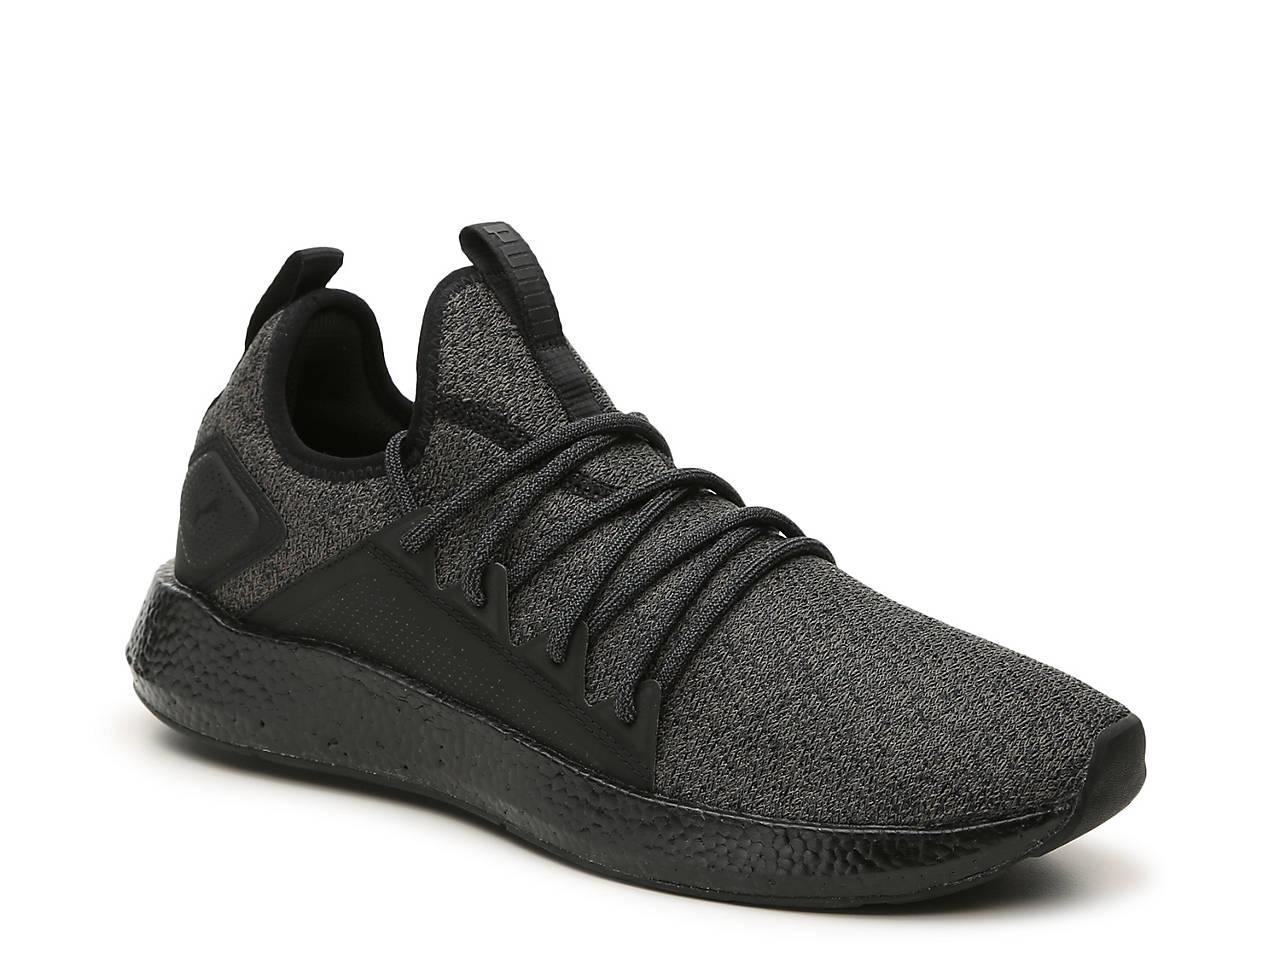 e899b48987c Puma Nrgy Neko Sneaker - Men s Men s Shoes